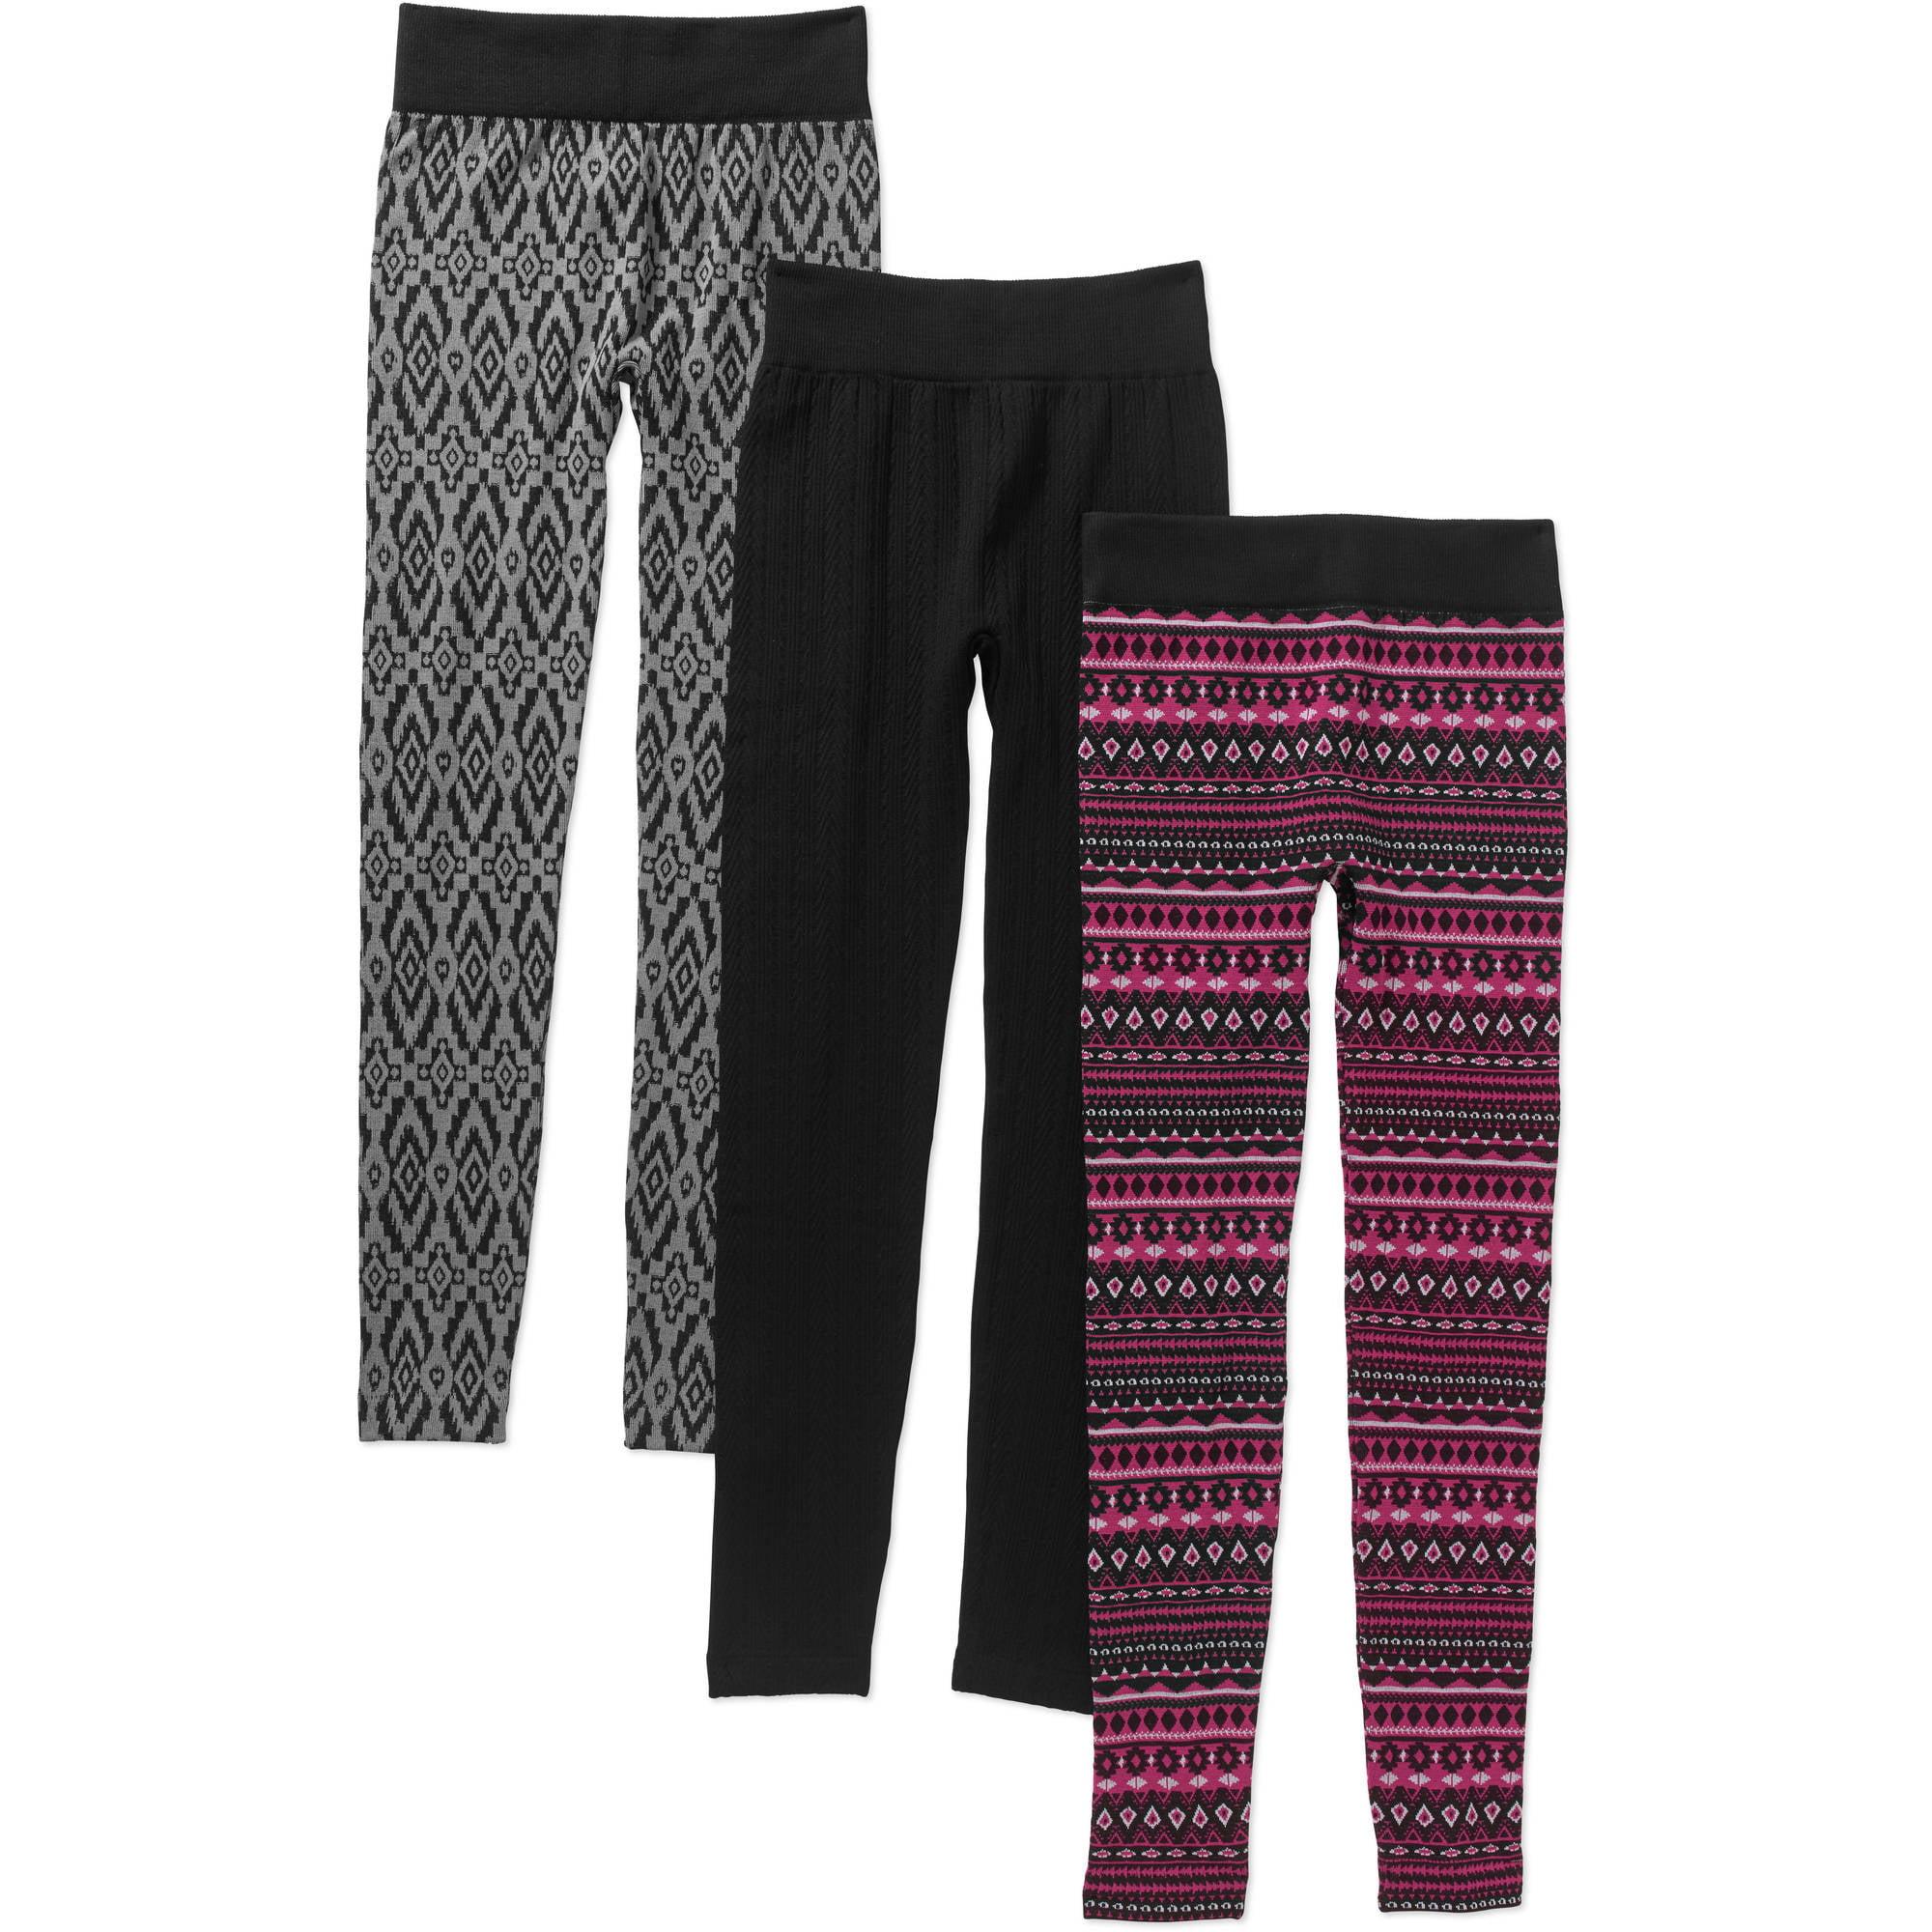 No Boundaries Juniors' Holiday Cozy Knit Fleece Leggings, 3pk Value Bundle